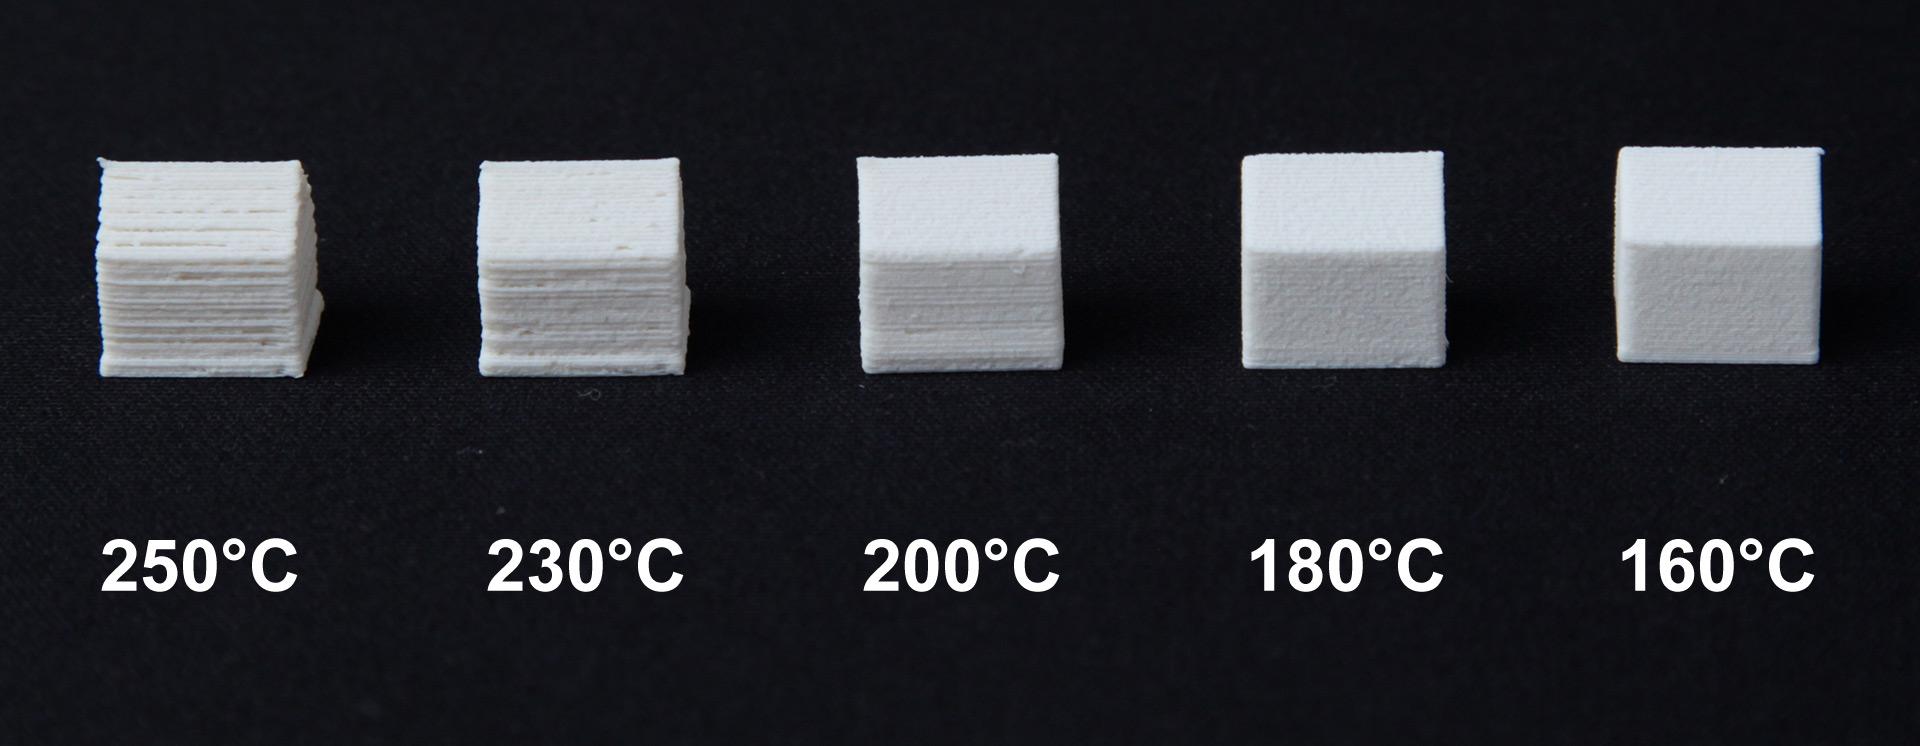 laybrick filament 3d printing blog. Black Bedroom Furniture Sets. Home Design Ideas